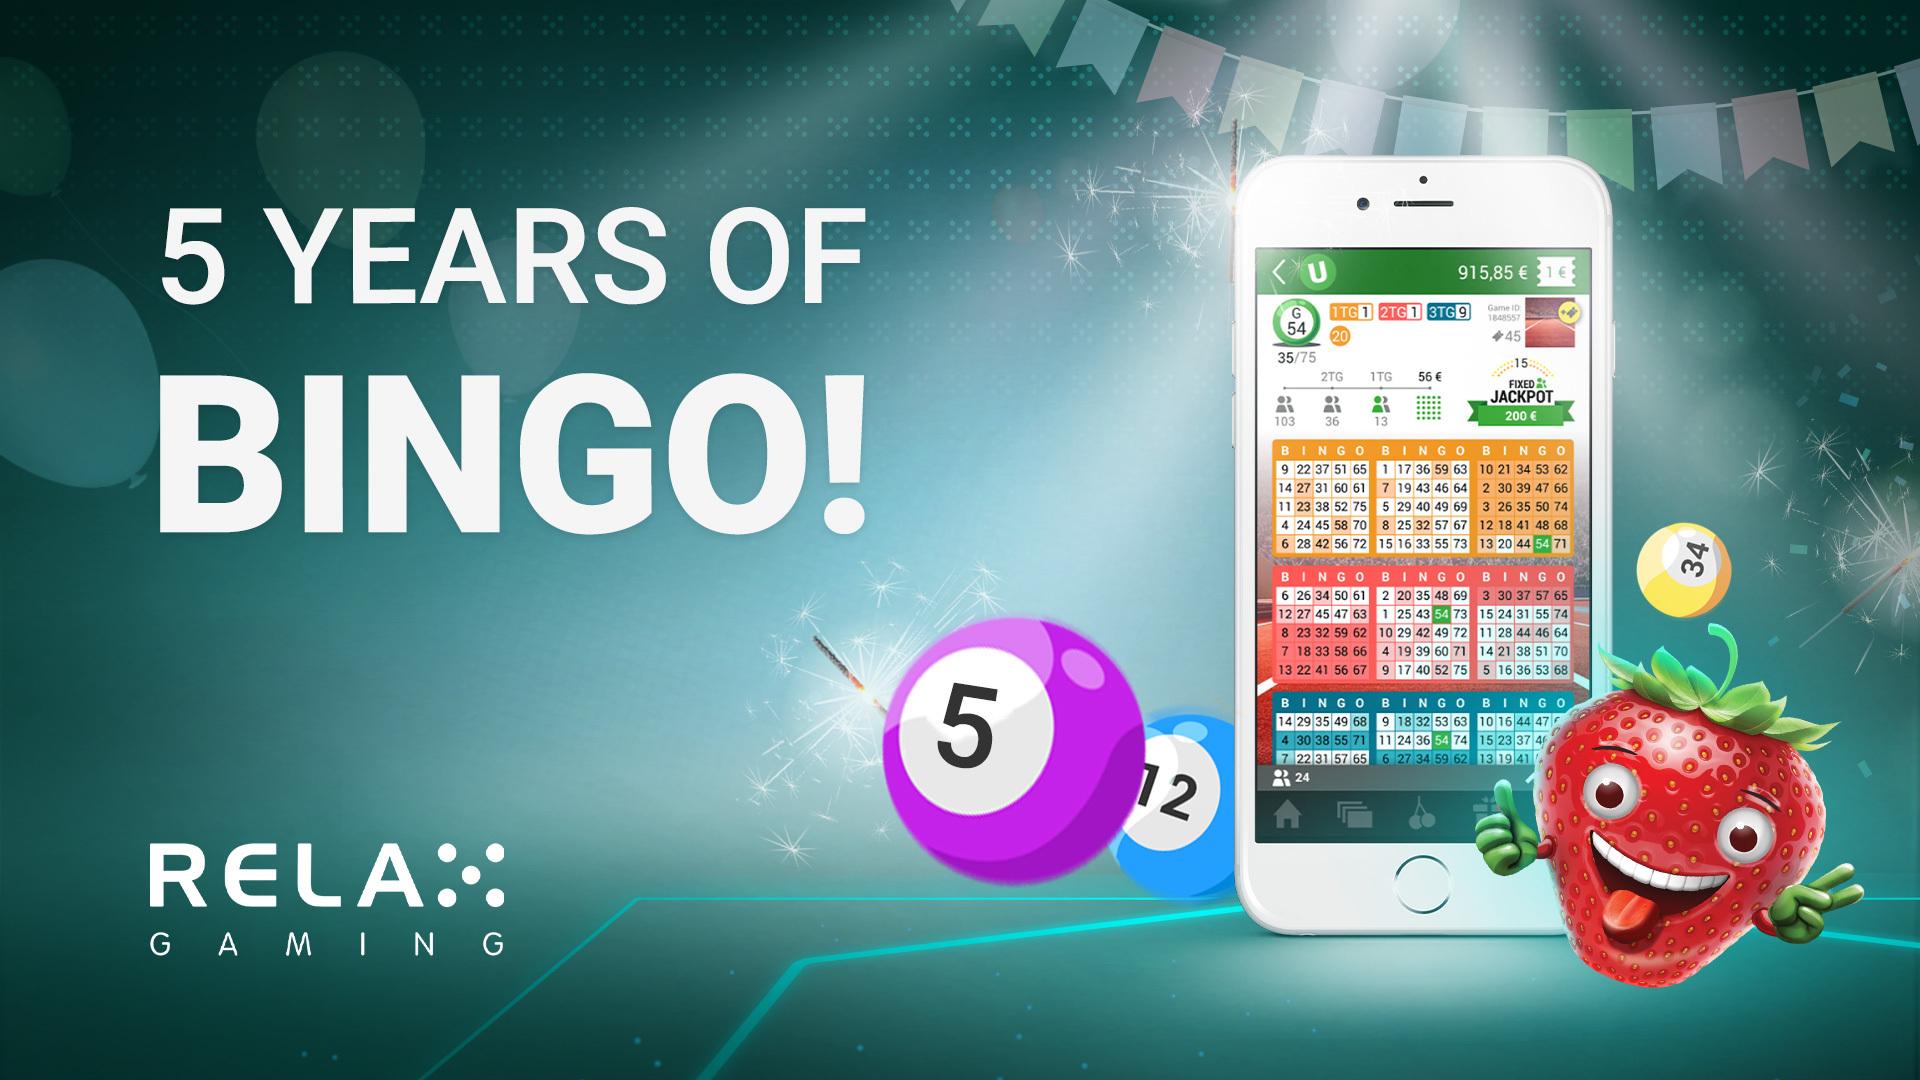 Bingo's 5th birthday